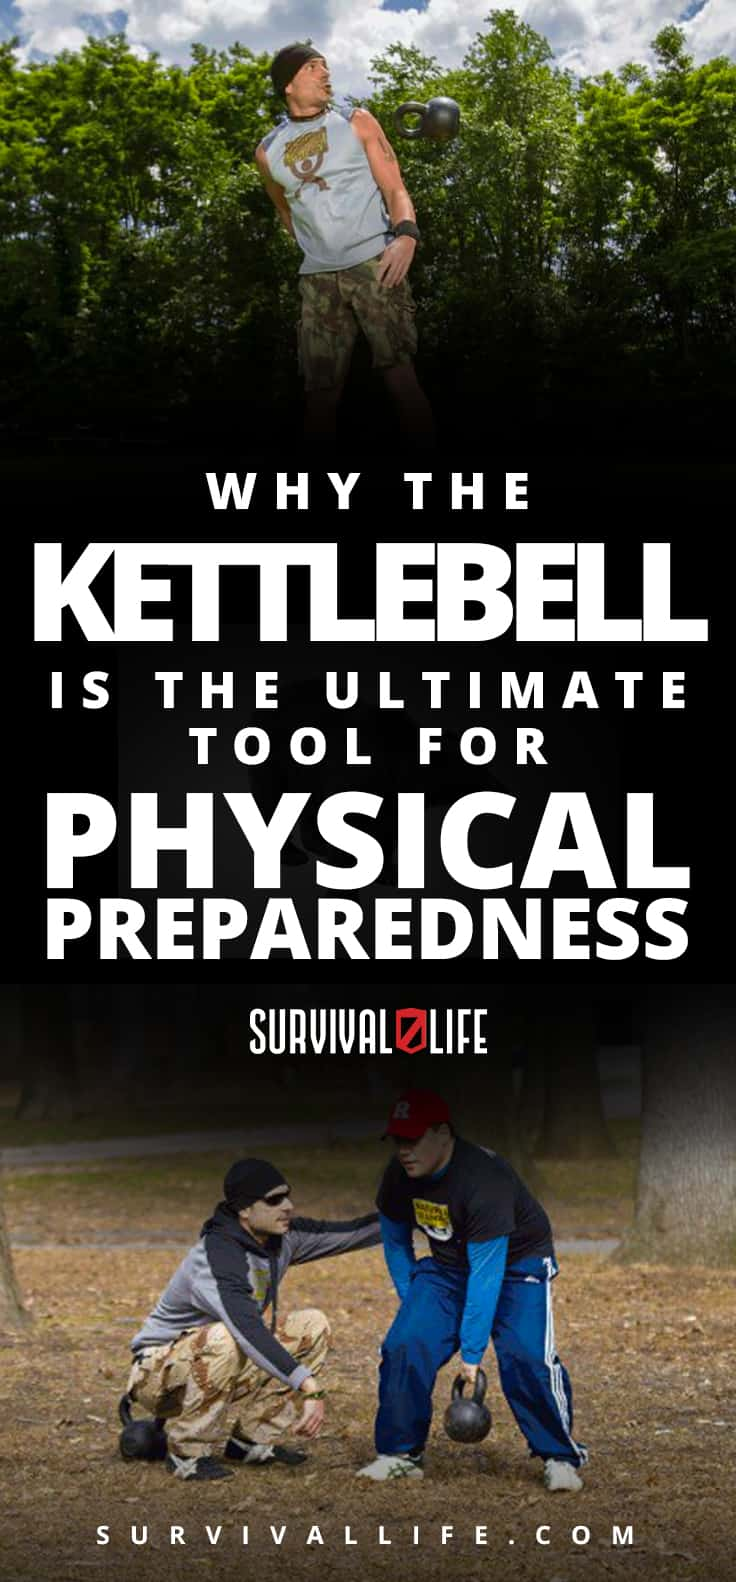 Placard   Kettlebell Physical Preparedness   Why The Kettlebell Is The Ultimate Tool For Physical Preparedness